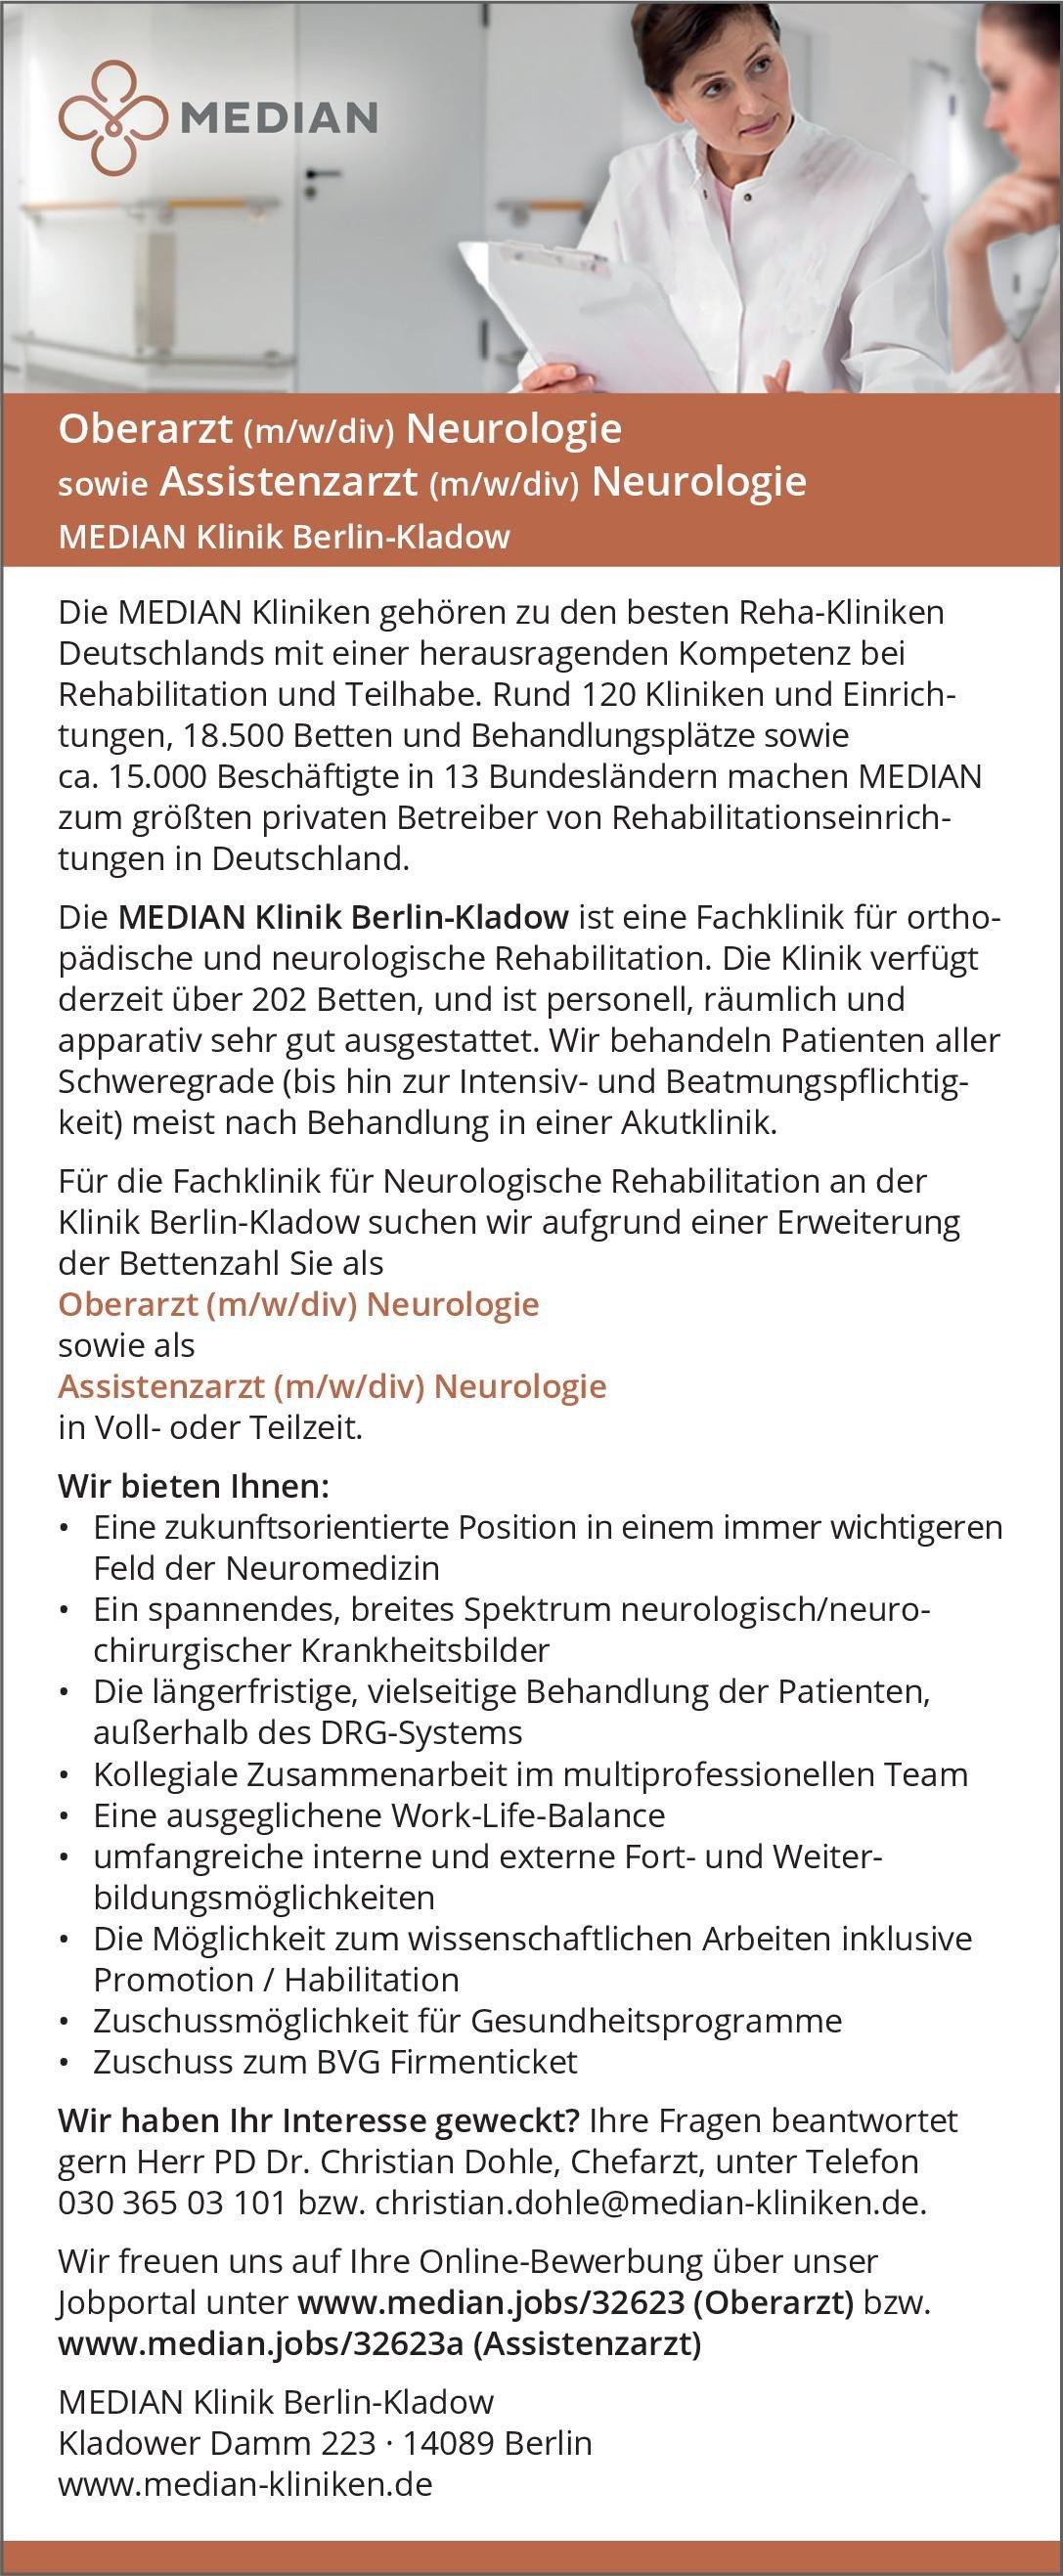 MEDIAN Klinik Berlin-Kladow Oberarzt (m/w/div) Neurologie Neurologie Oberarzt